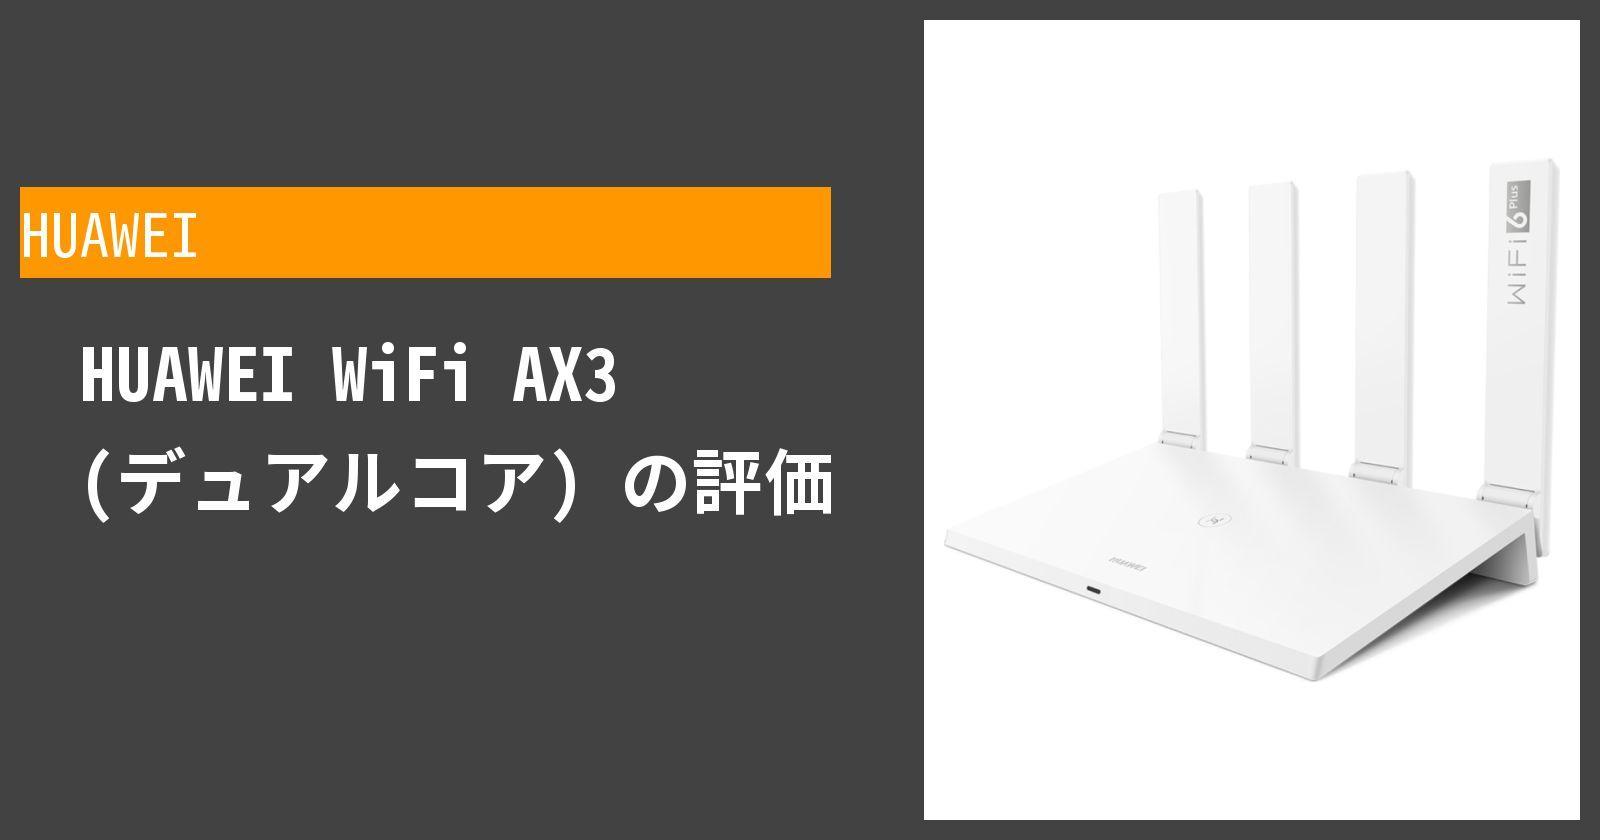 HUAWEI WiFi AX3 (デュアルコア)を徹底評価